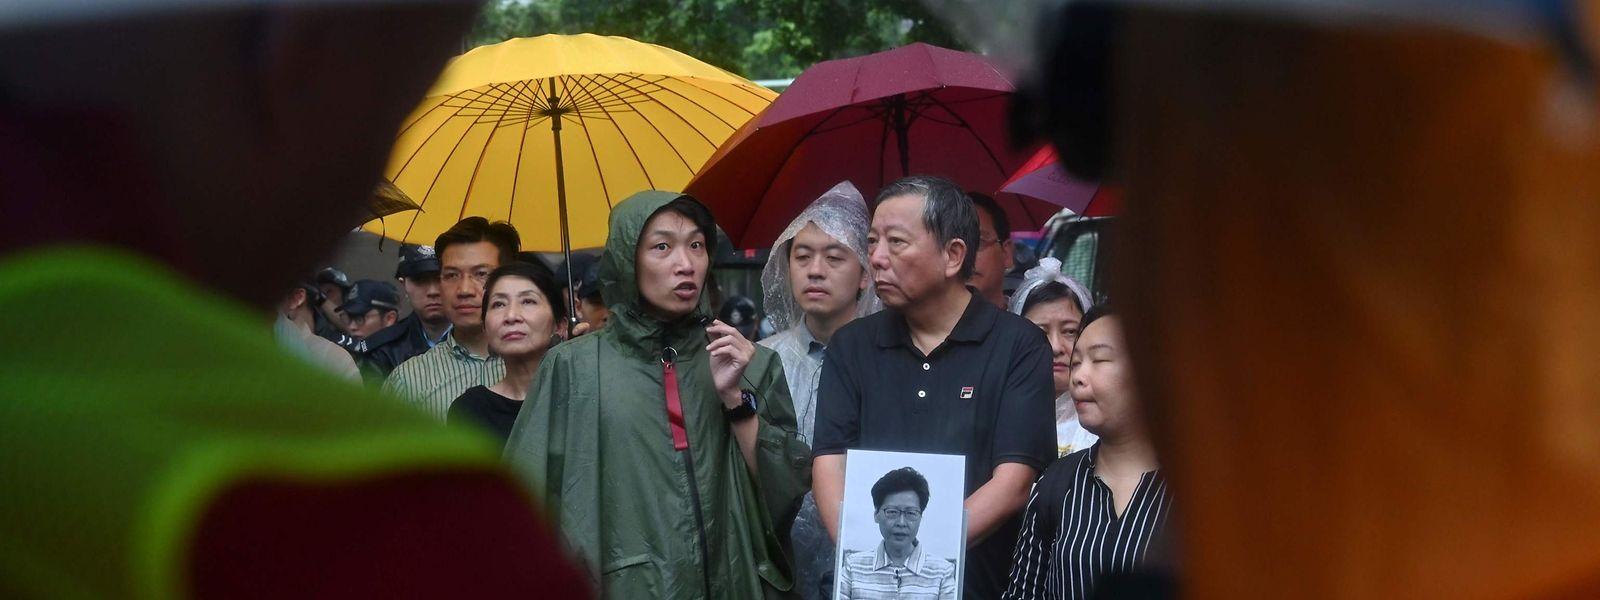 Proteste vor dem Regierungsgebäude in Hongkong am Donnerstag.